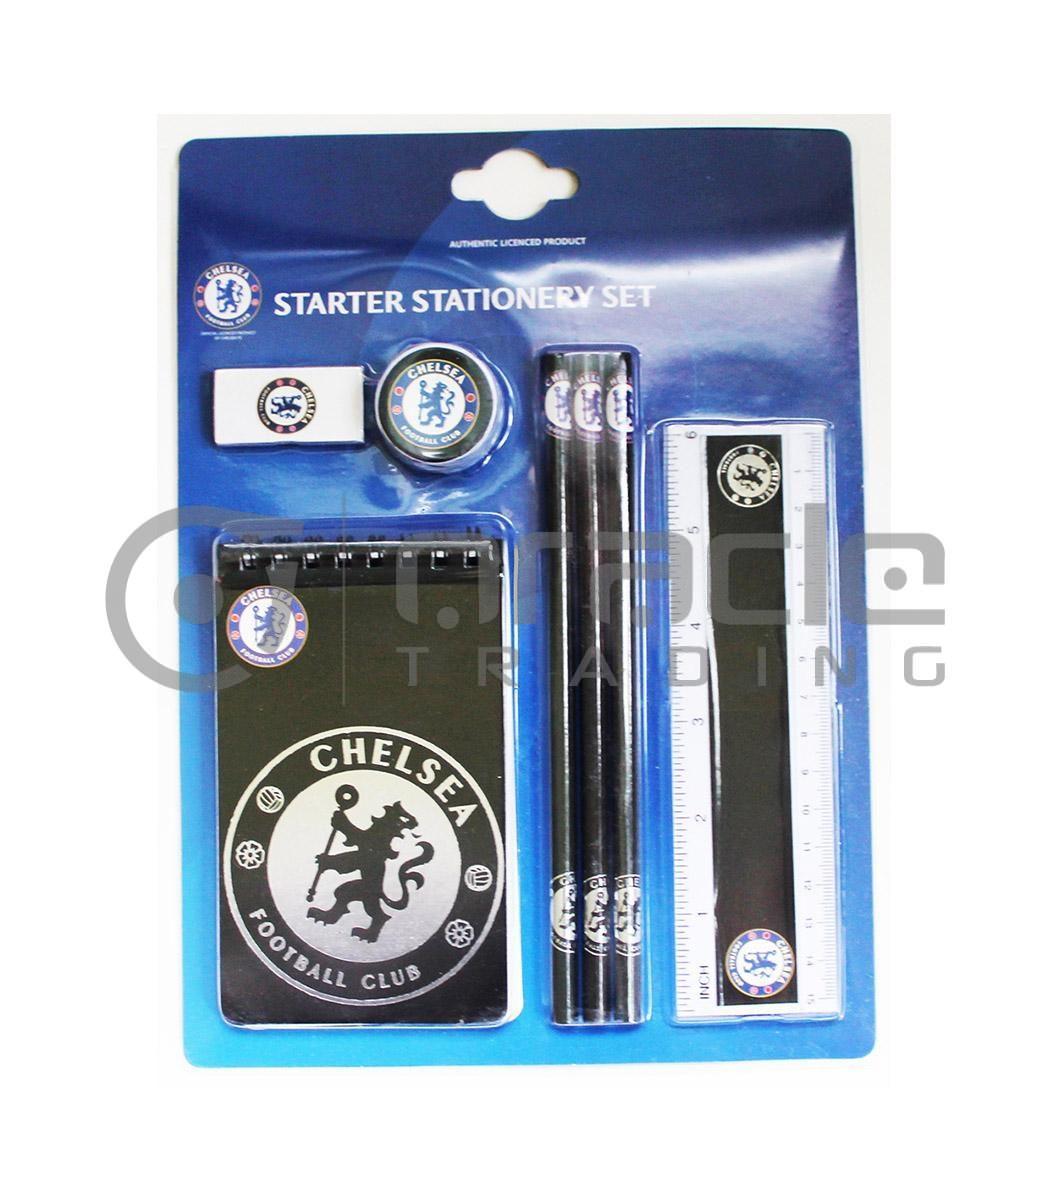 Chelsea Starter Stationery Set